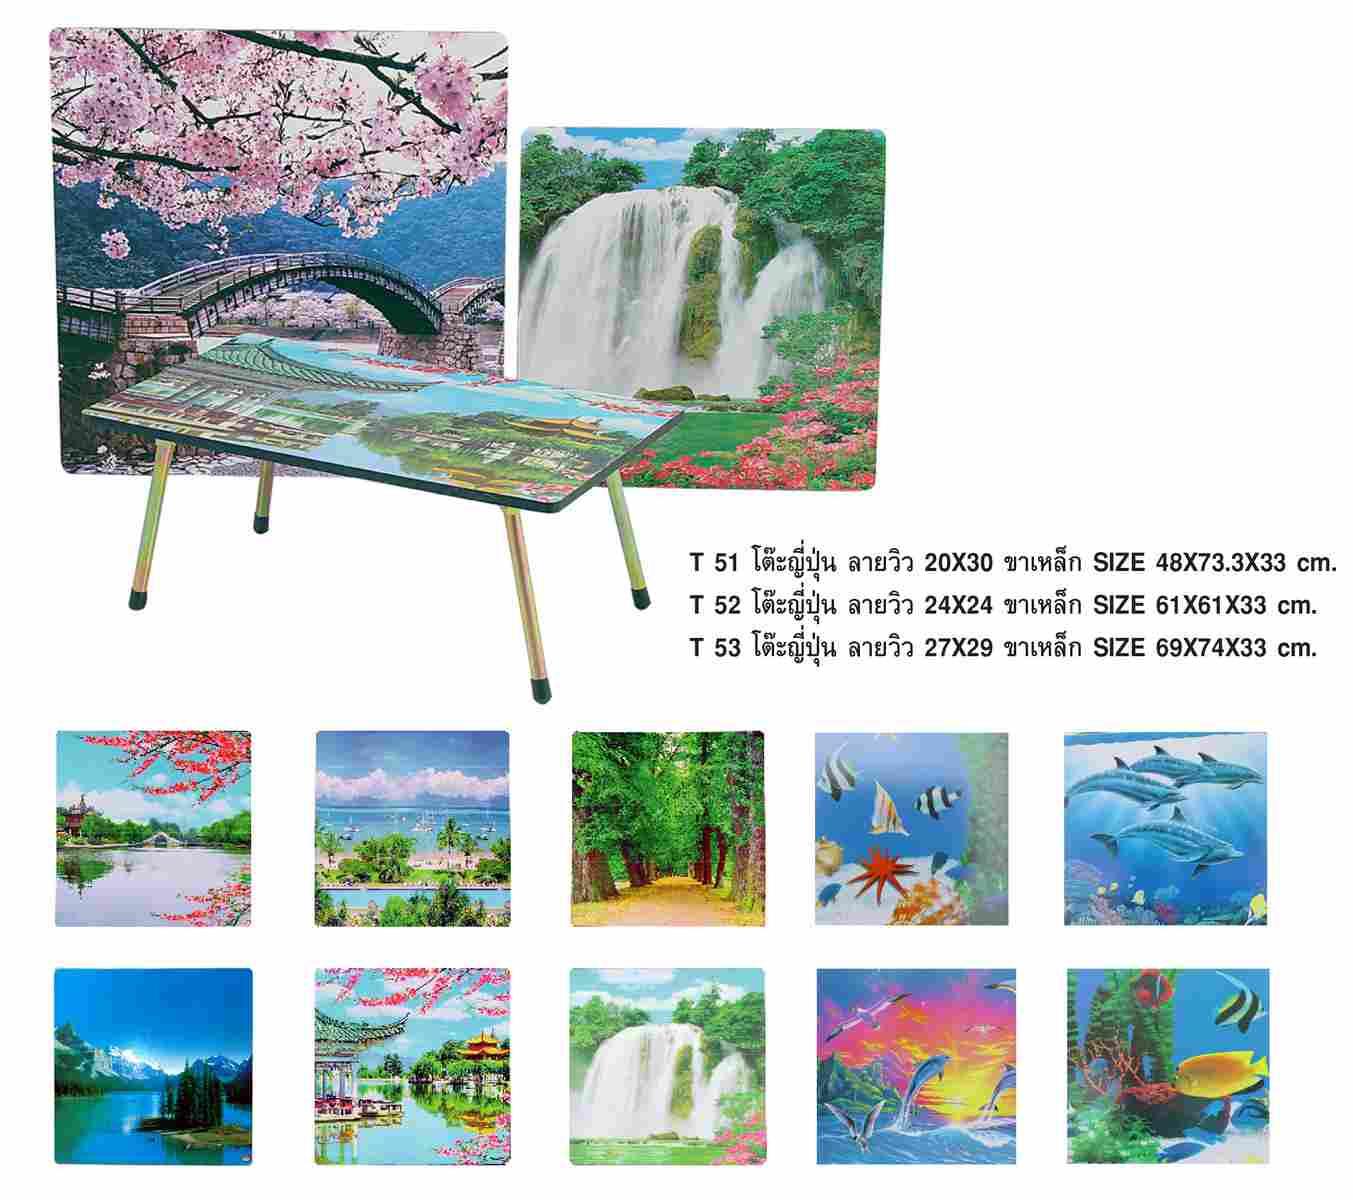 PMY24-8 โต๊ะญี่ปุ่นลายวิว